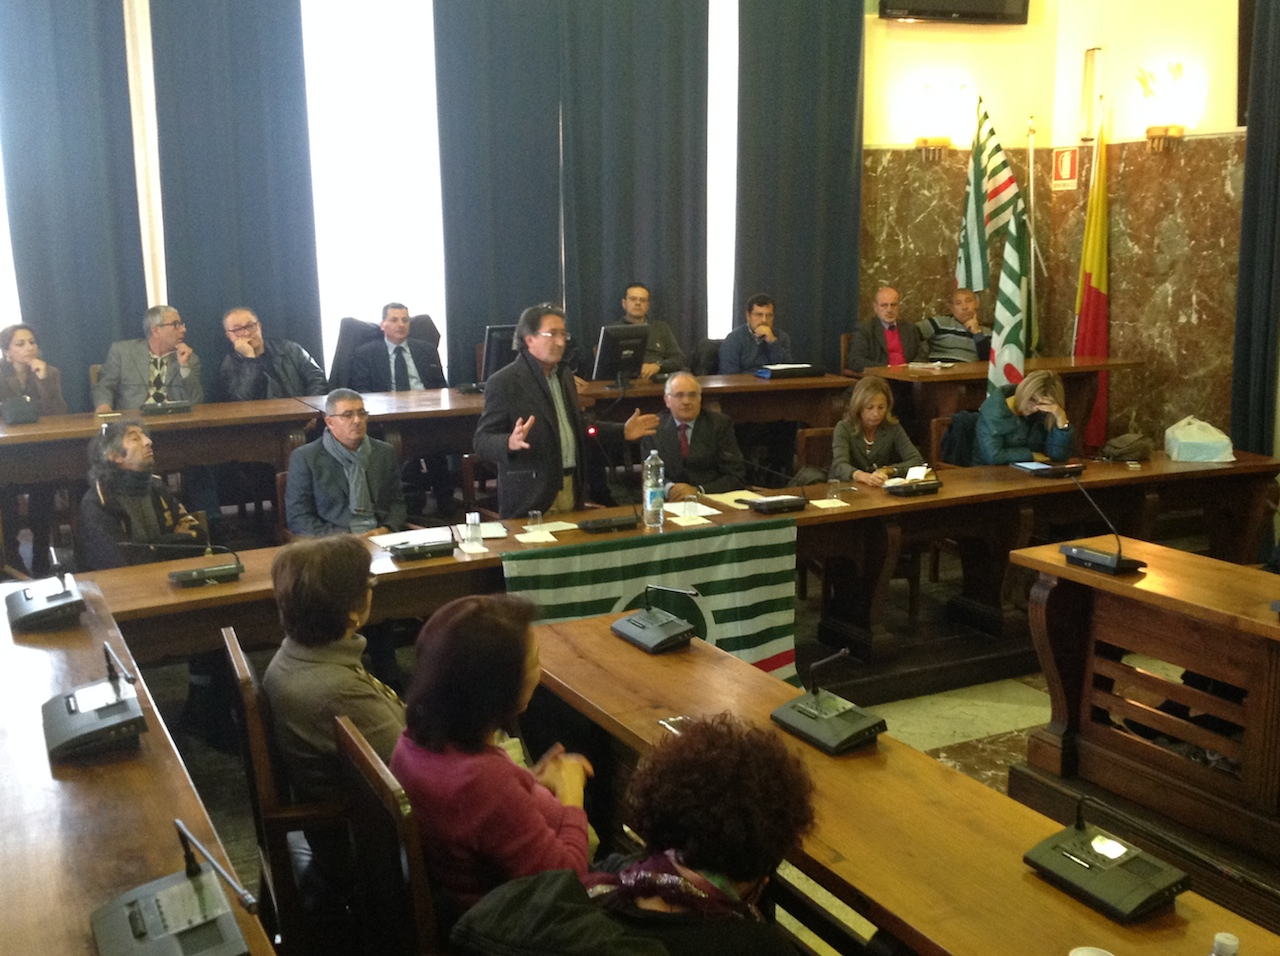 assemblea cisl fp comune messina 4 dicembre 2013